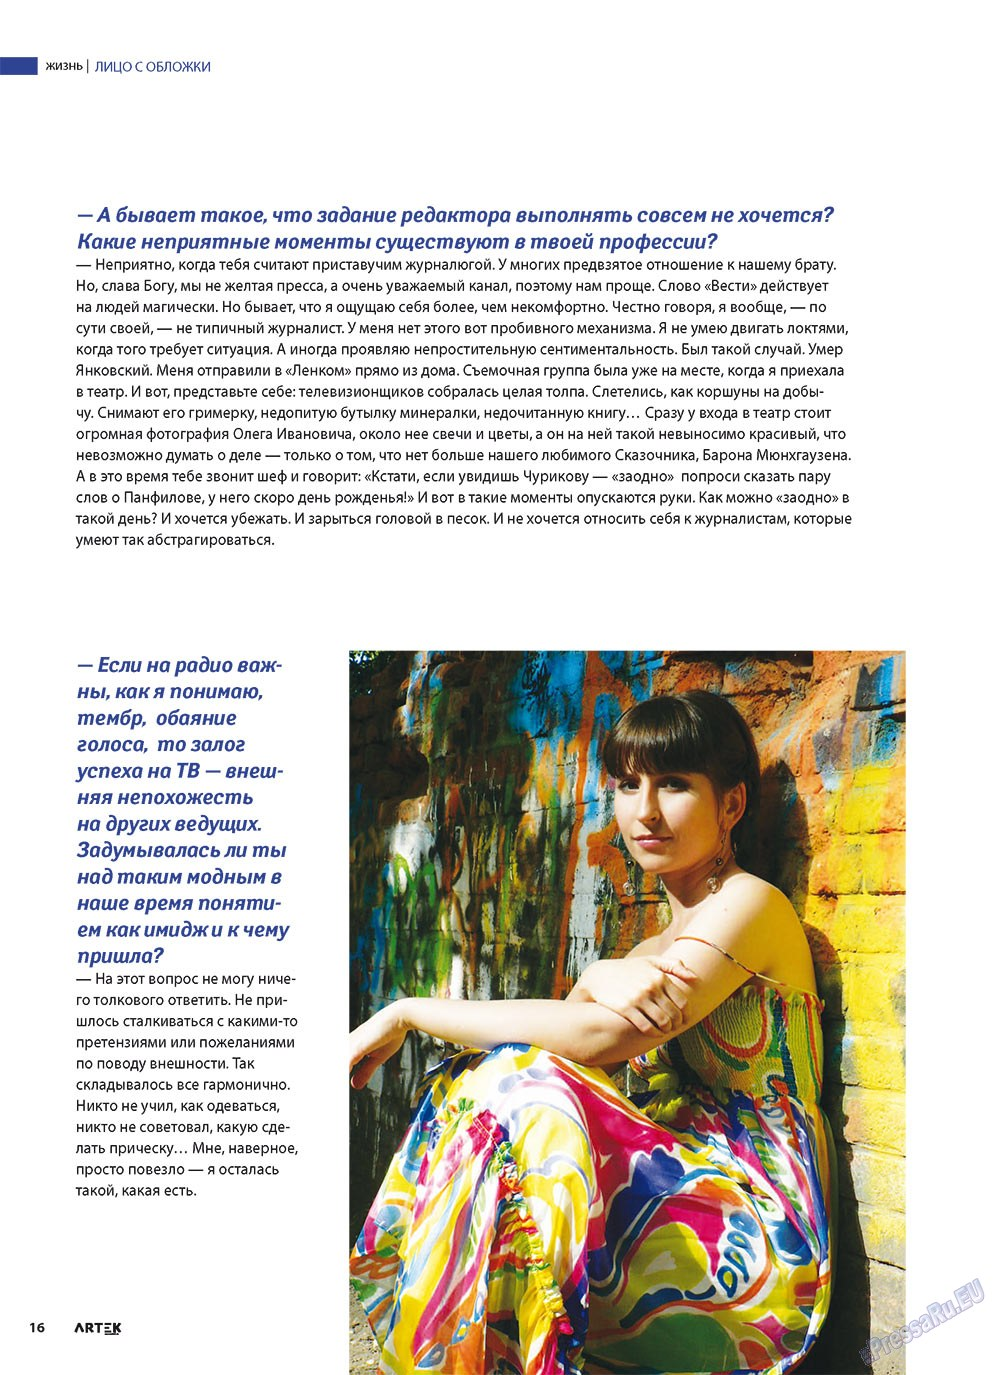 Артек (журнал). 2011 год, номер 1, стр. 18